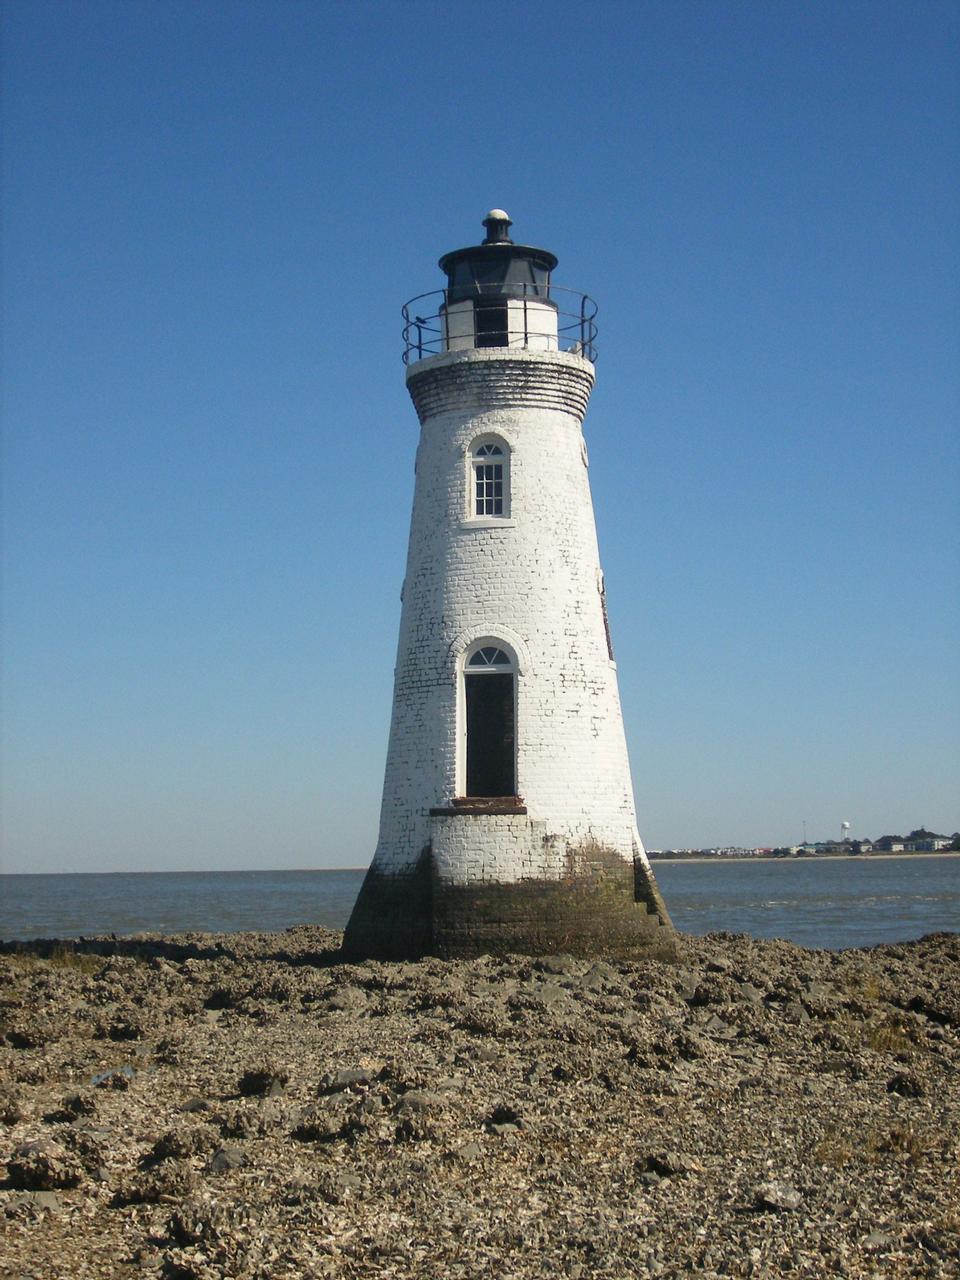 Cockspur島の灯台